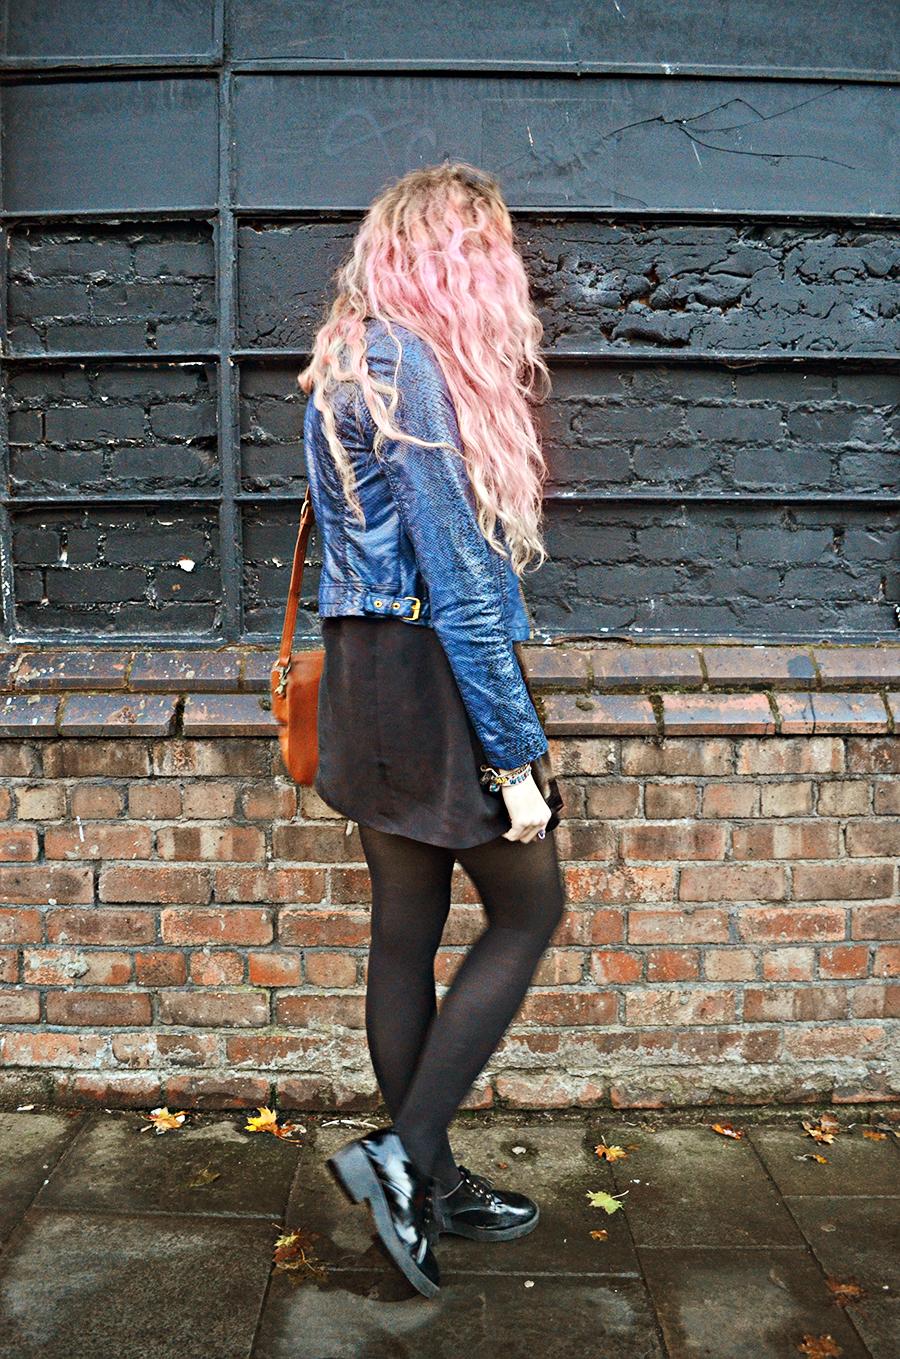 Blue Snakeskin Leather Jacket// Vintage Velvet Dress// Little White Lies Tights// Primark Patent Brogues// Asos Tan Bag// Nica Necklace// Lilac Moon Rings// Vintage, Euphoria, Oceanic